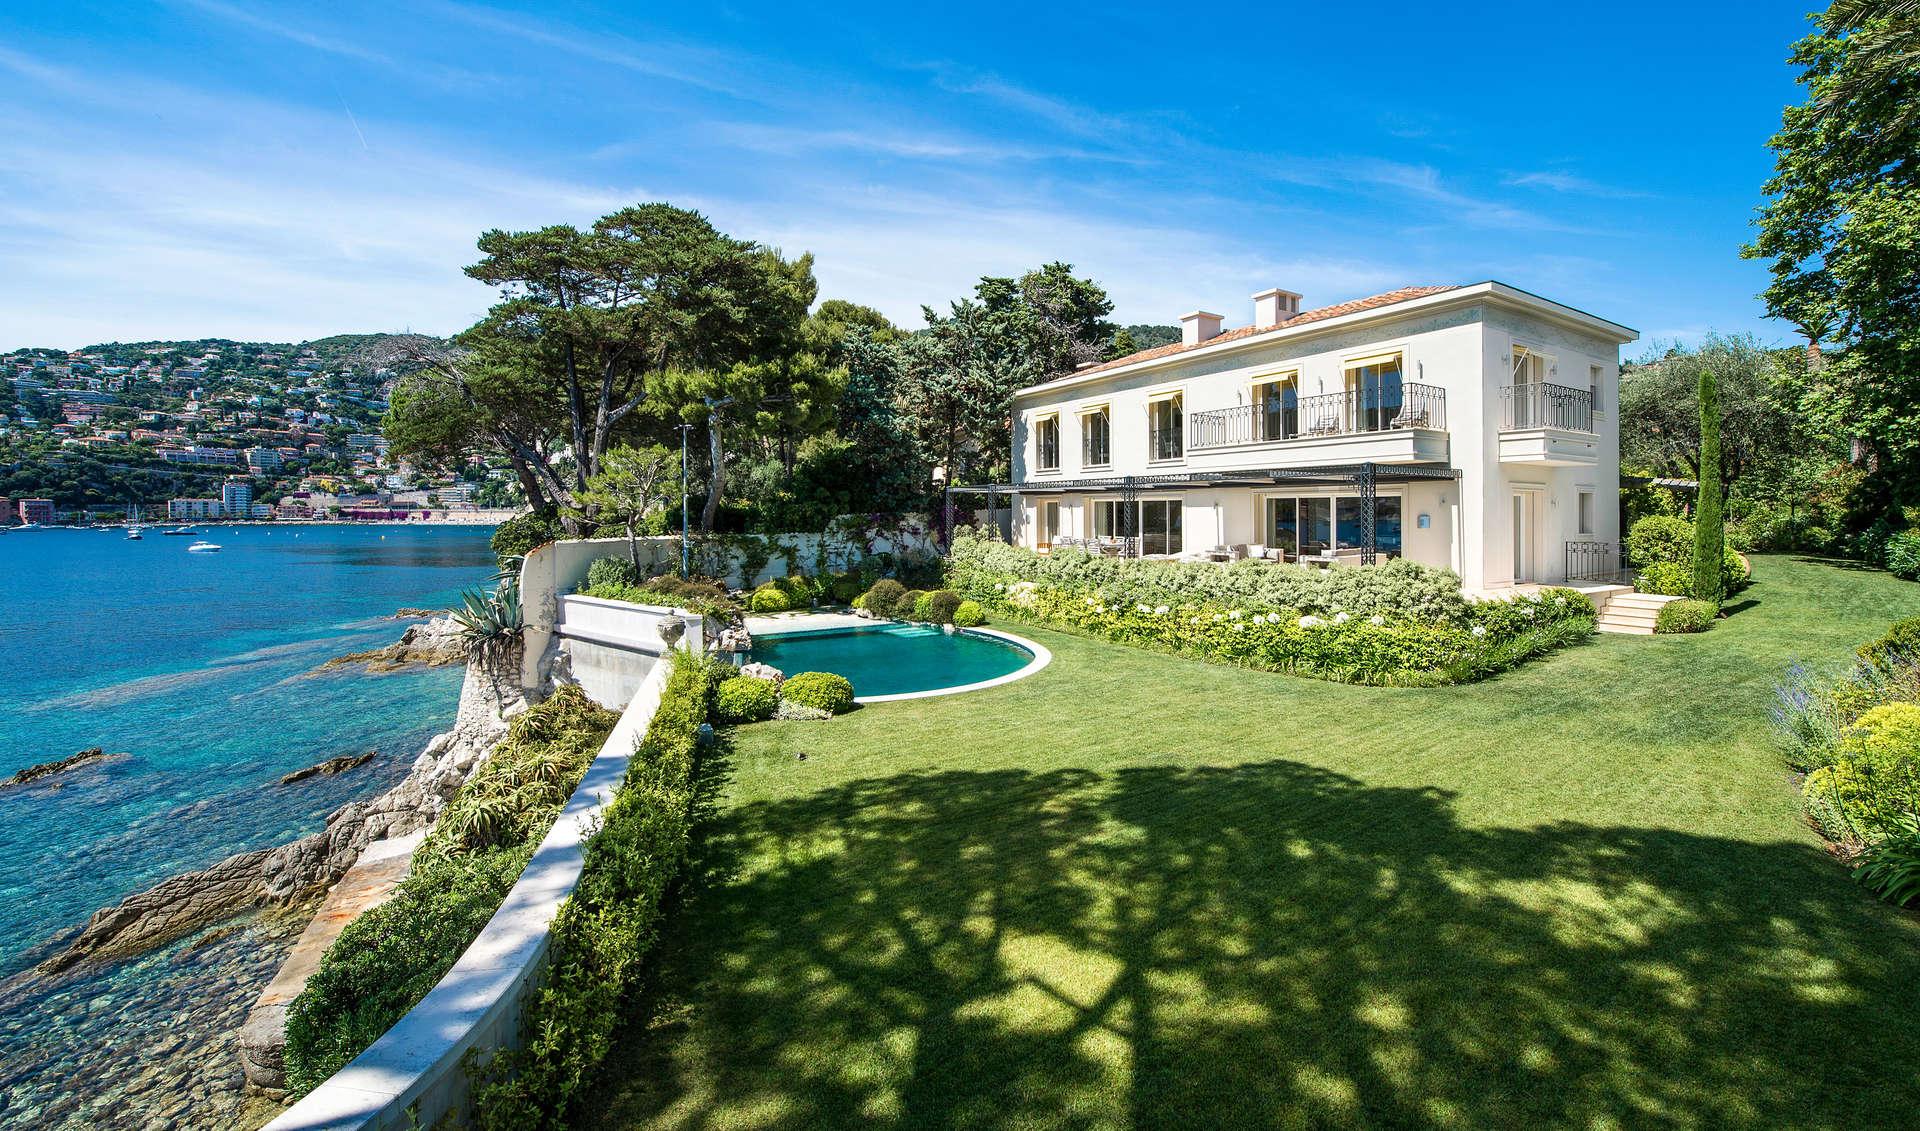 Luxury vacation rentals europe - France - Frenchriviera - Saint jean cap ferrat - Villa Espalmador - Image 1/17